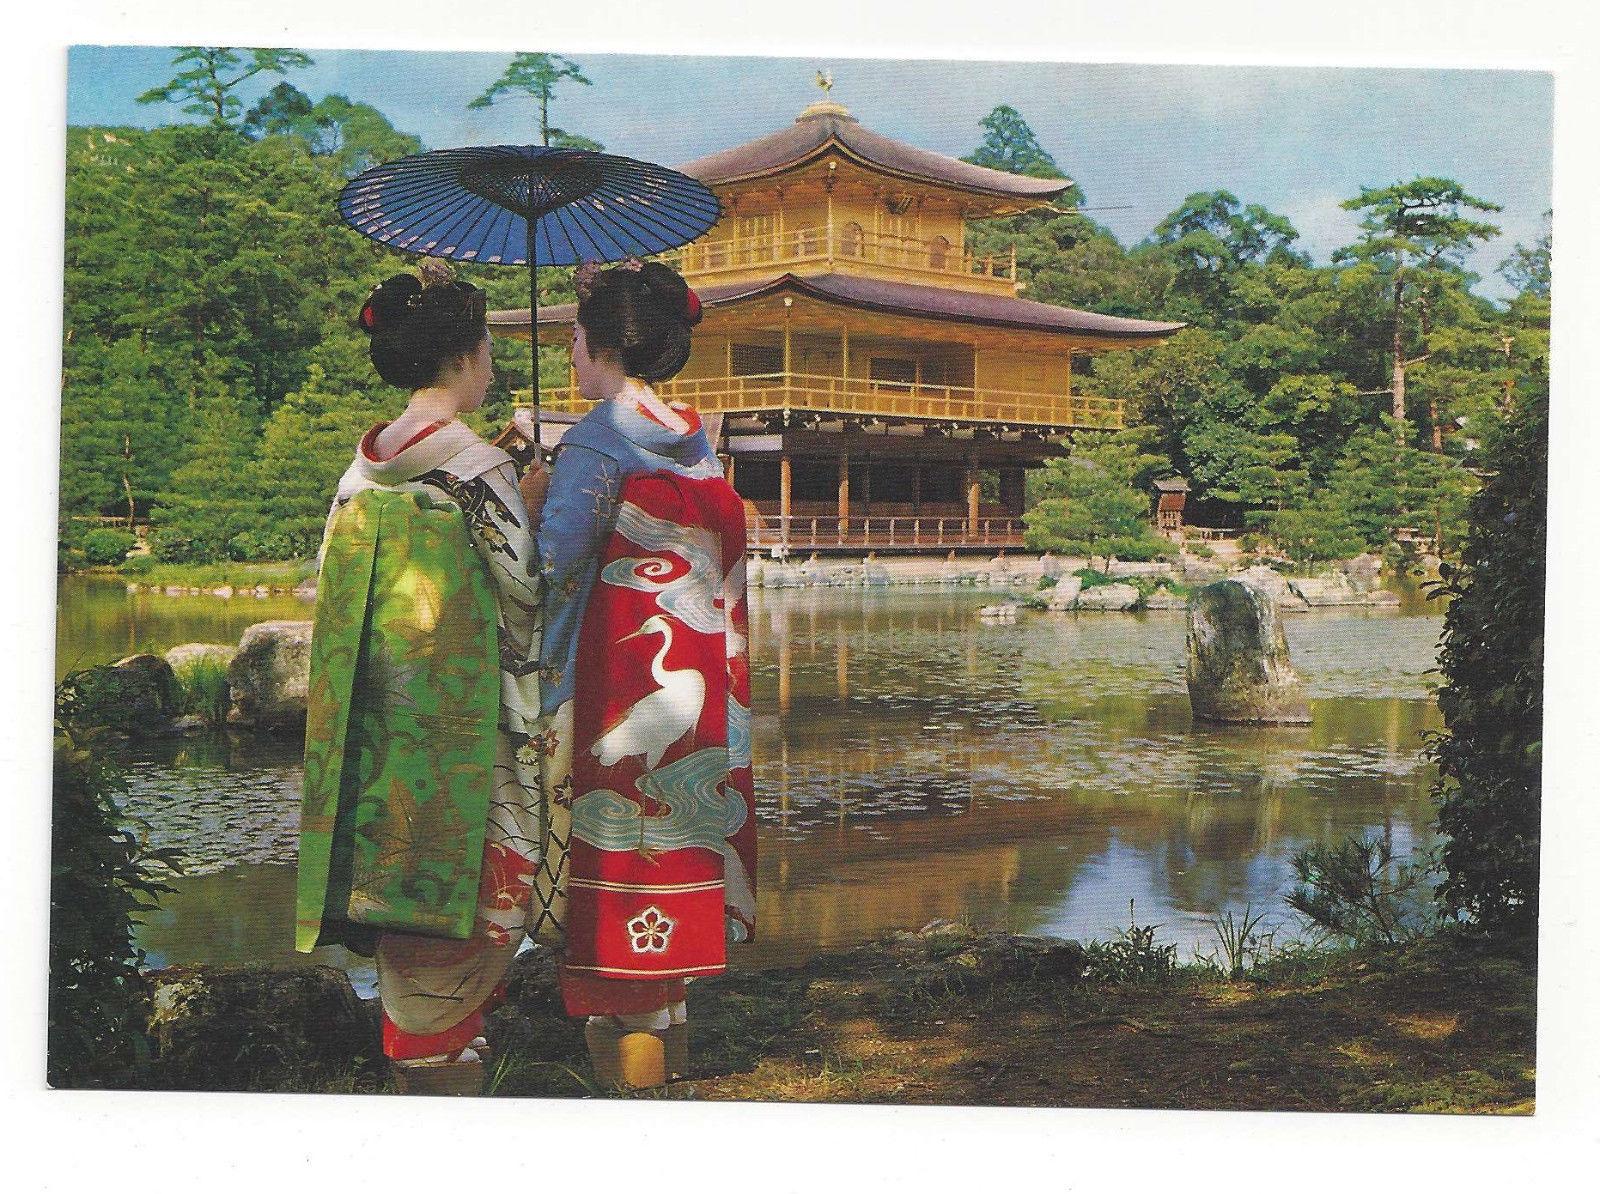 Japan Kyoto Maiko Dancers Golden Pavilion Kimono Obi Vtg Postcard 4X6